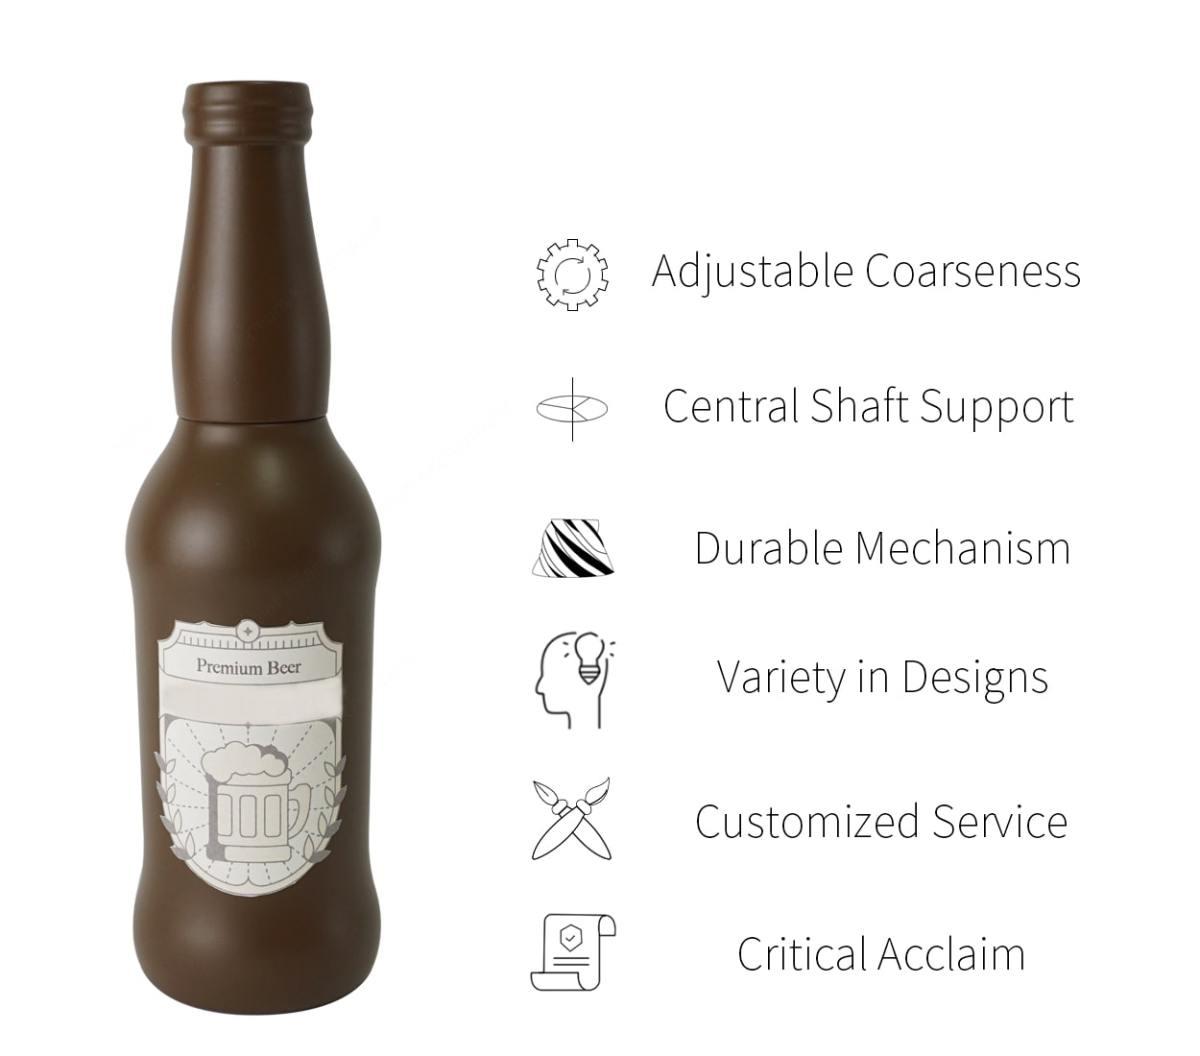 Holar - Salt and Pepper - Wood Mill - BR-02 Beer Bottle Shaped Pepper Mill - Brief